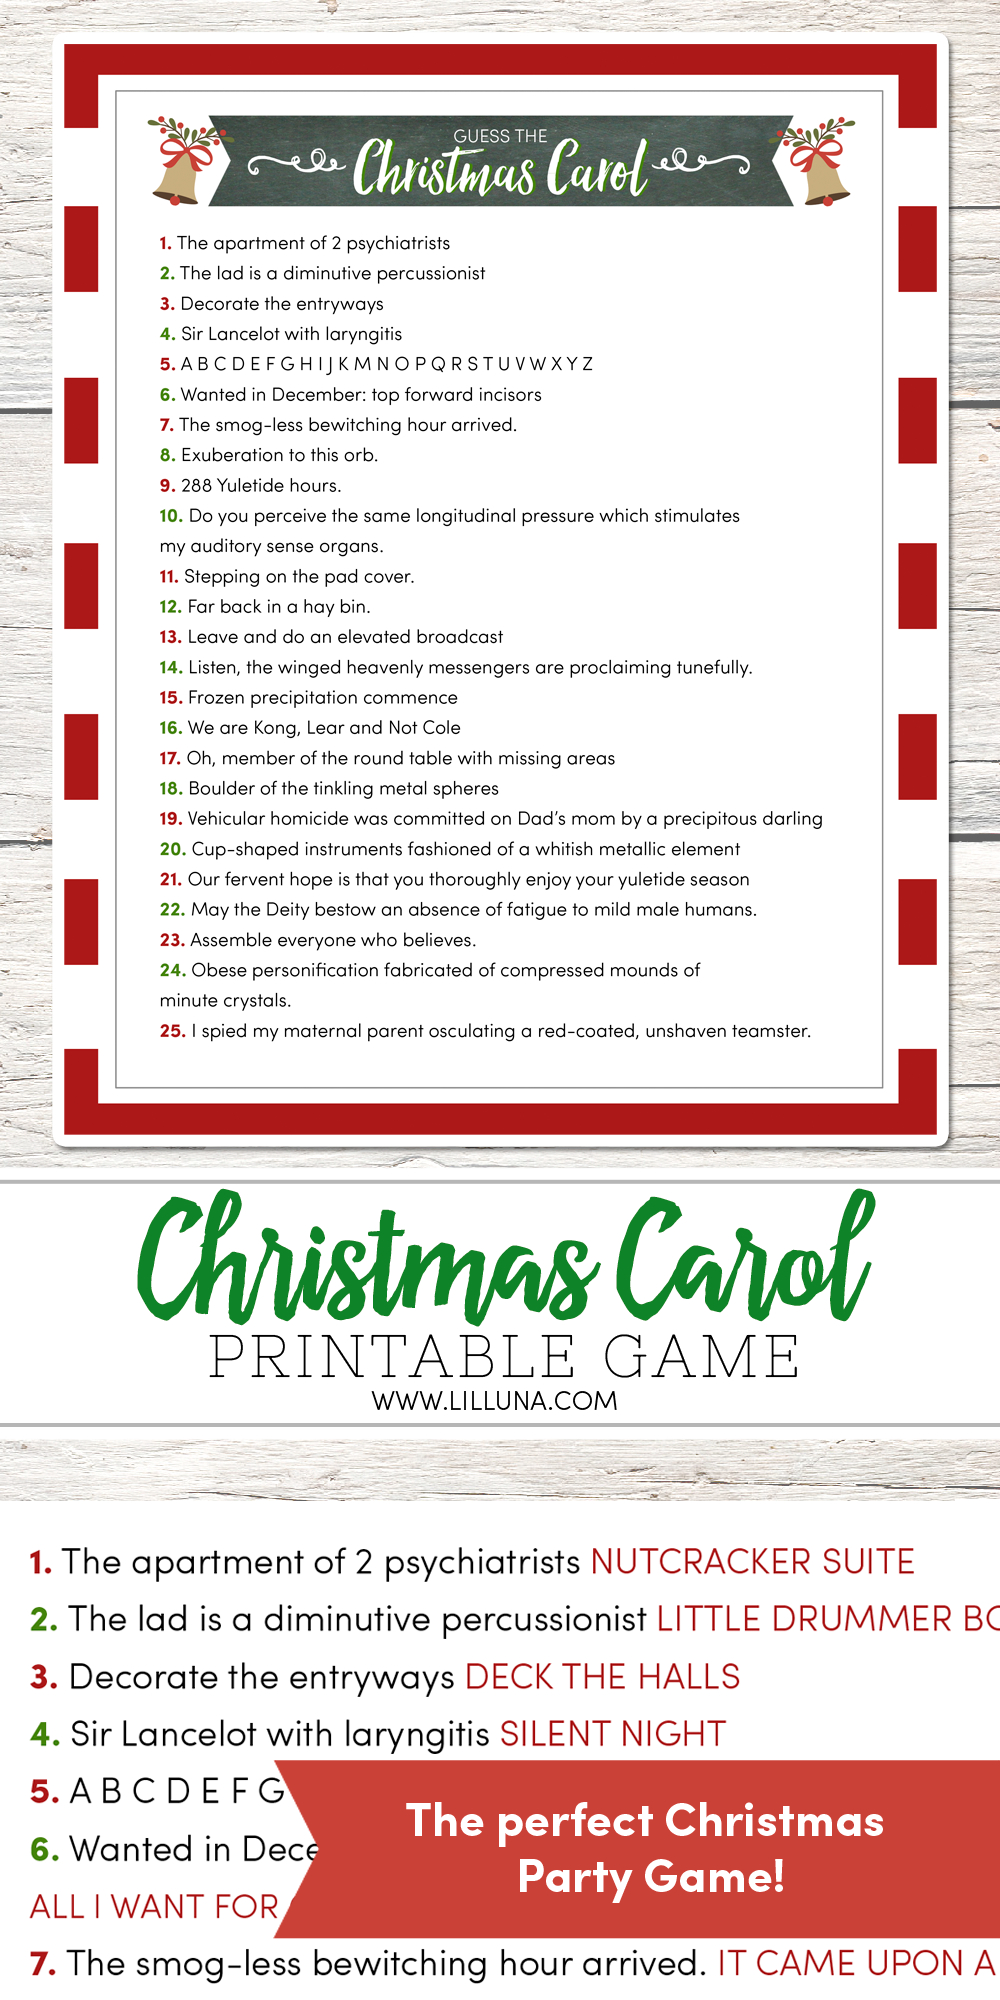 Guess The Christmas Carol Game - Lil' Luna - Free Printable Christmas Song Quiz